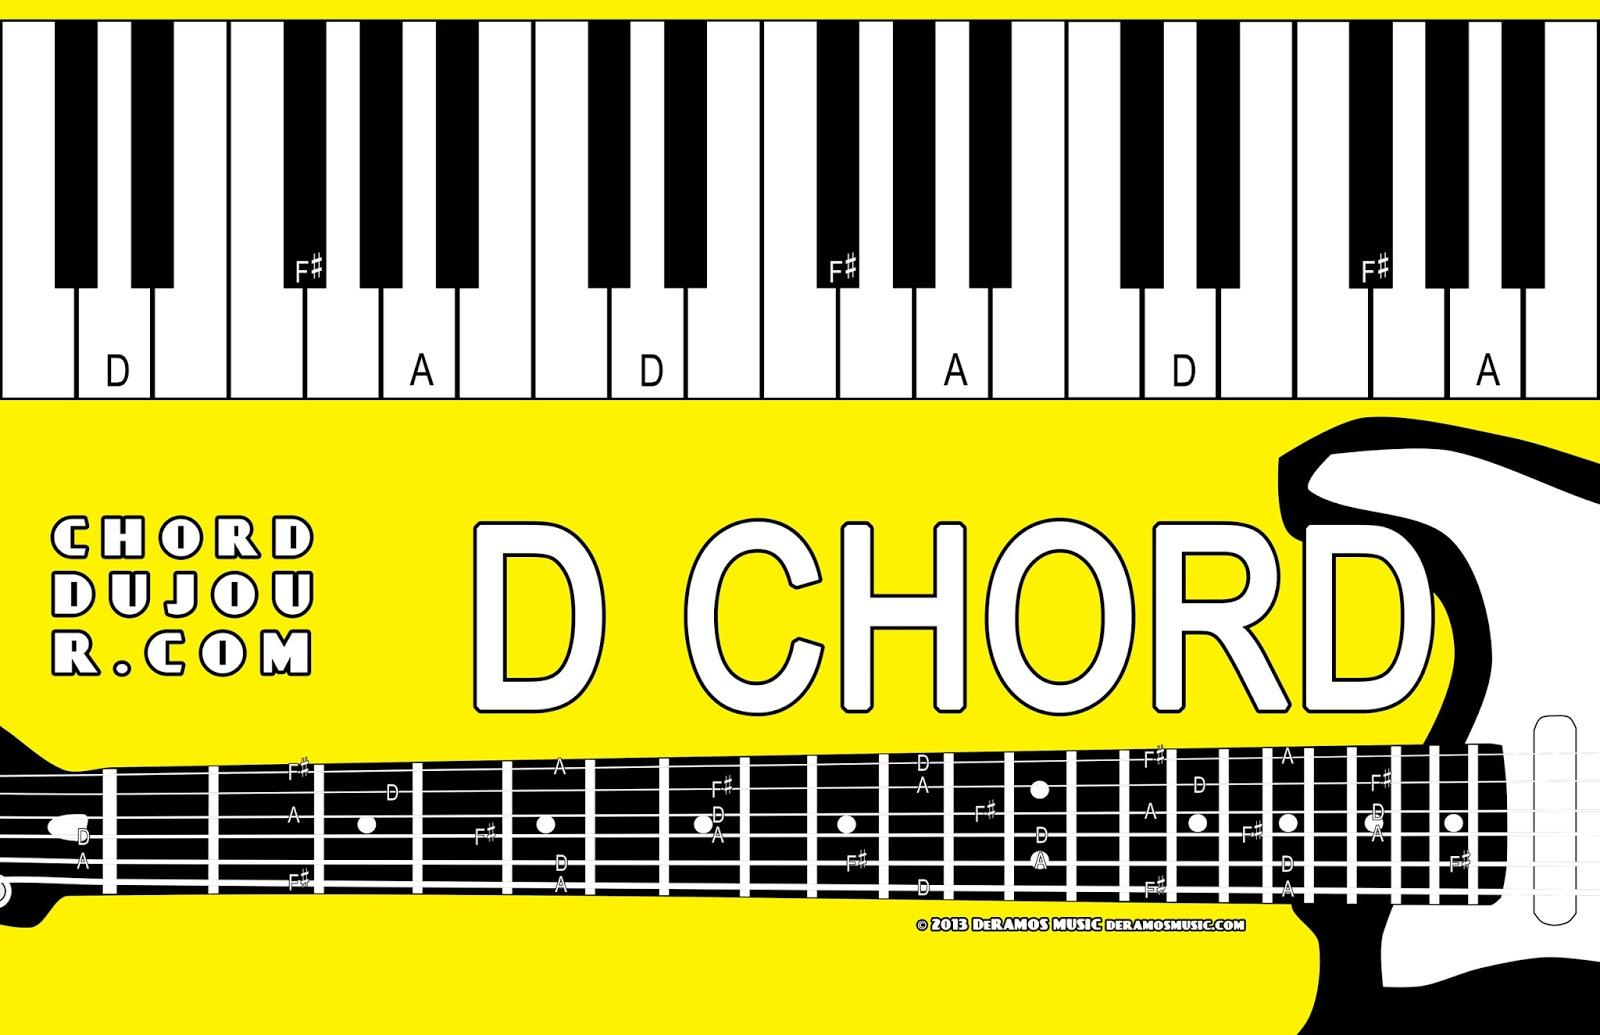 Chord du jour august 2013 dictionary d chord hexwebz Gallery